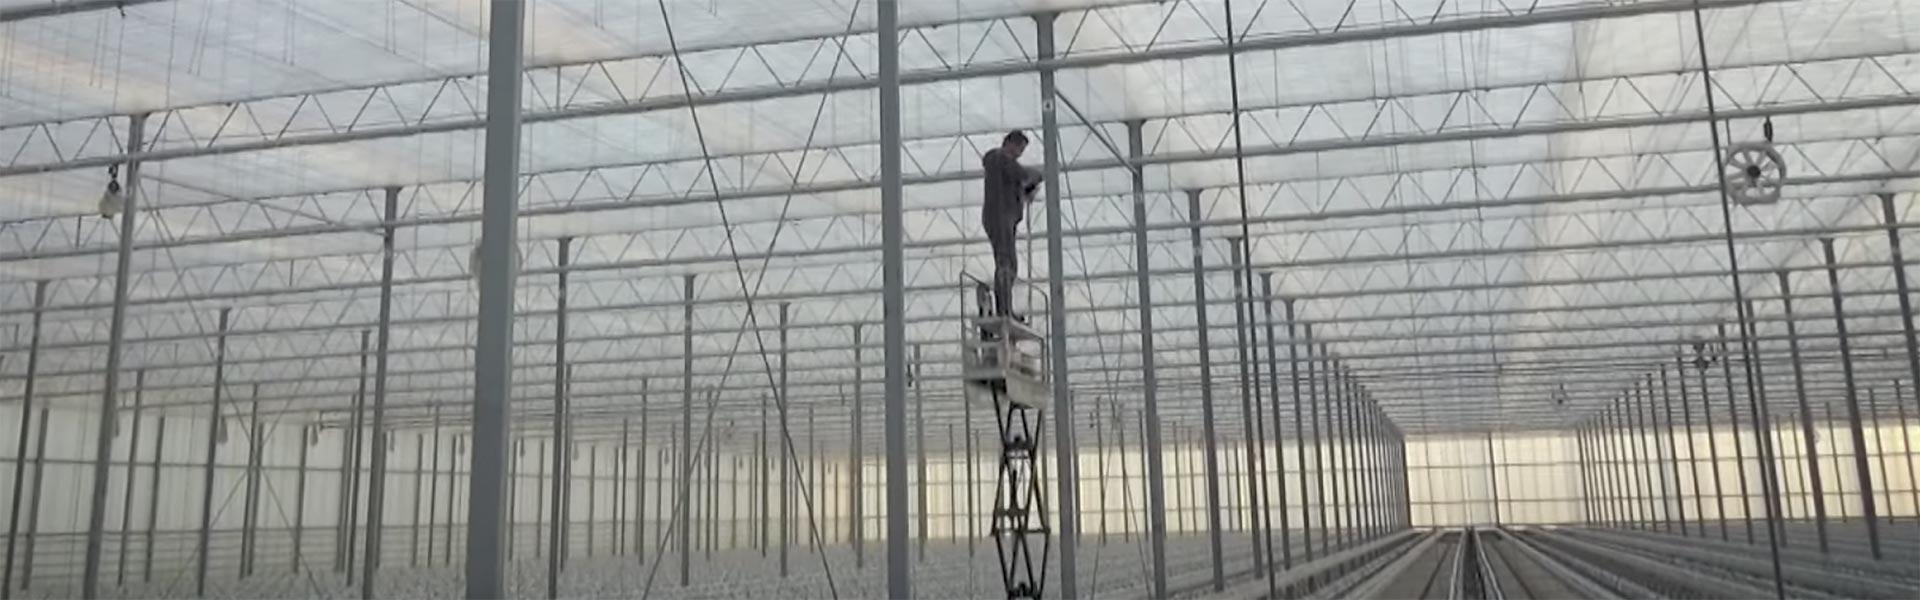 oplossing-touwhangen-kas